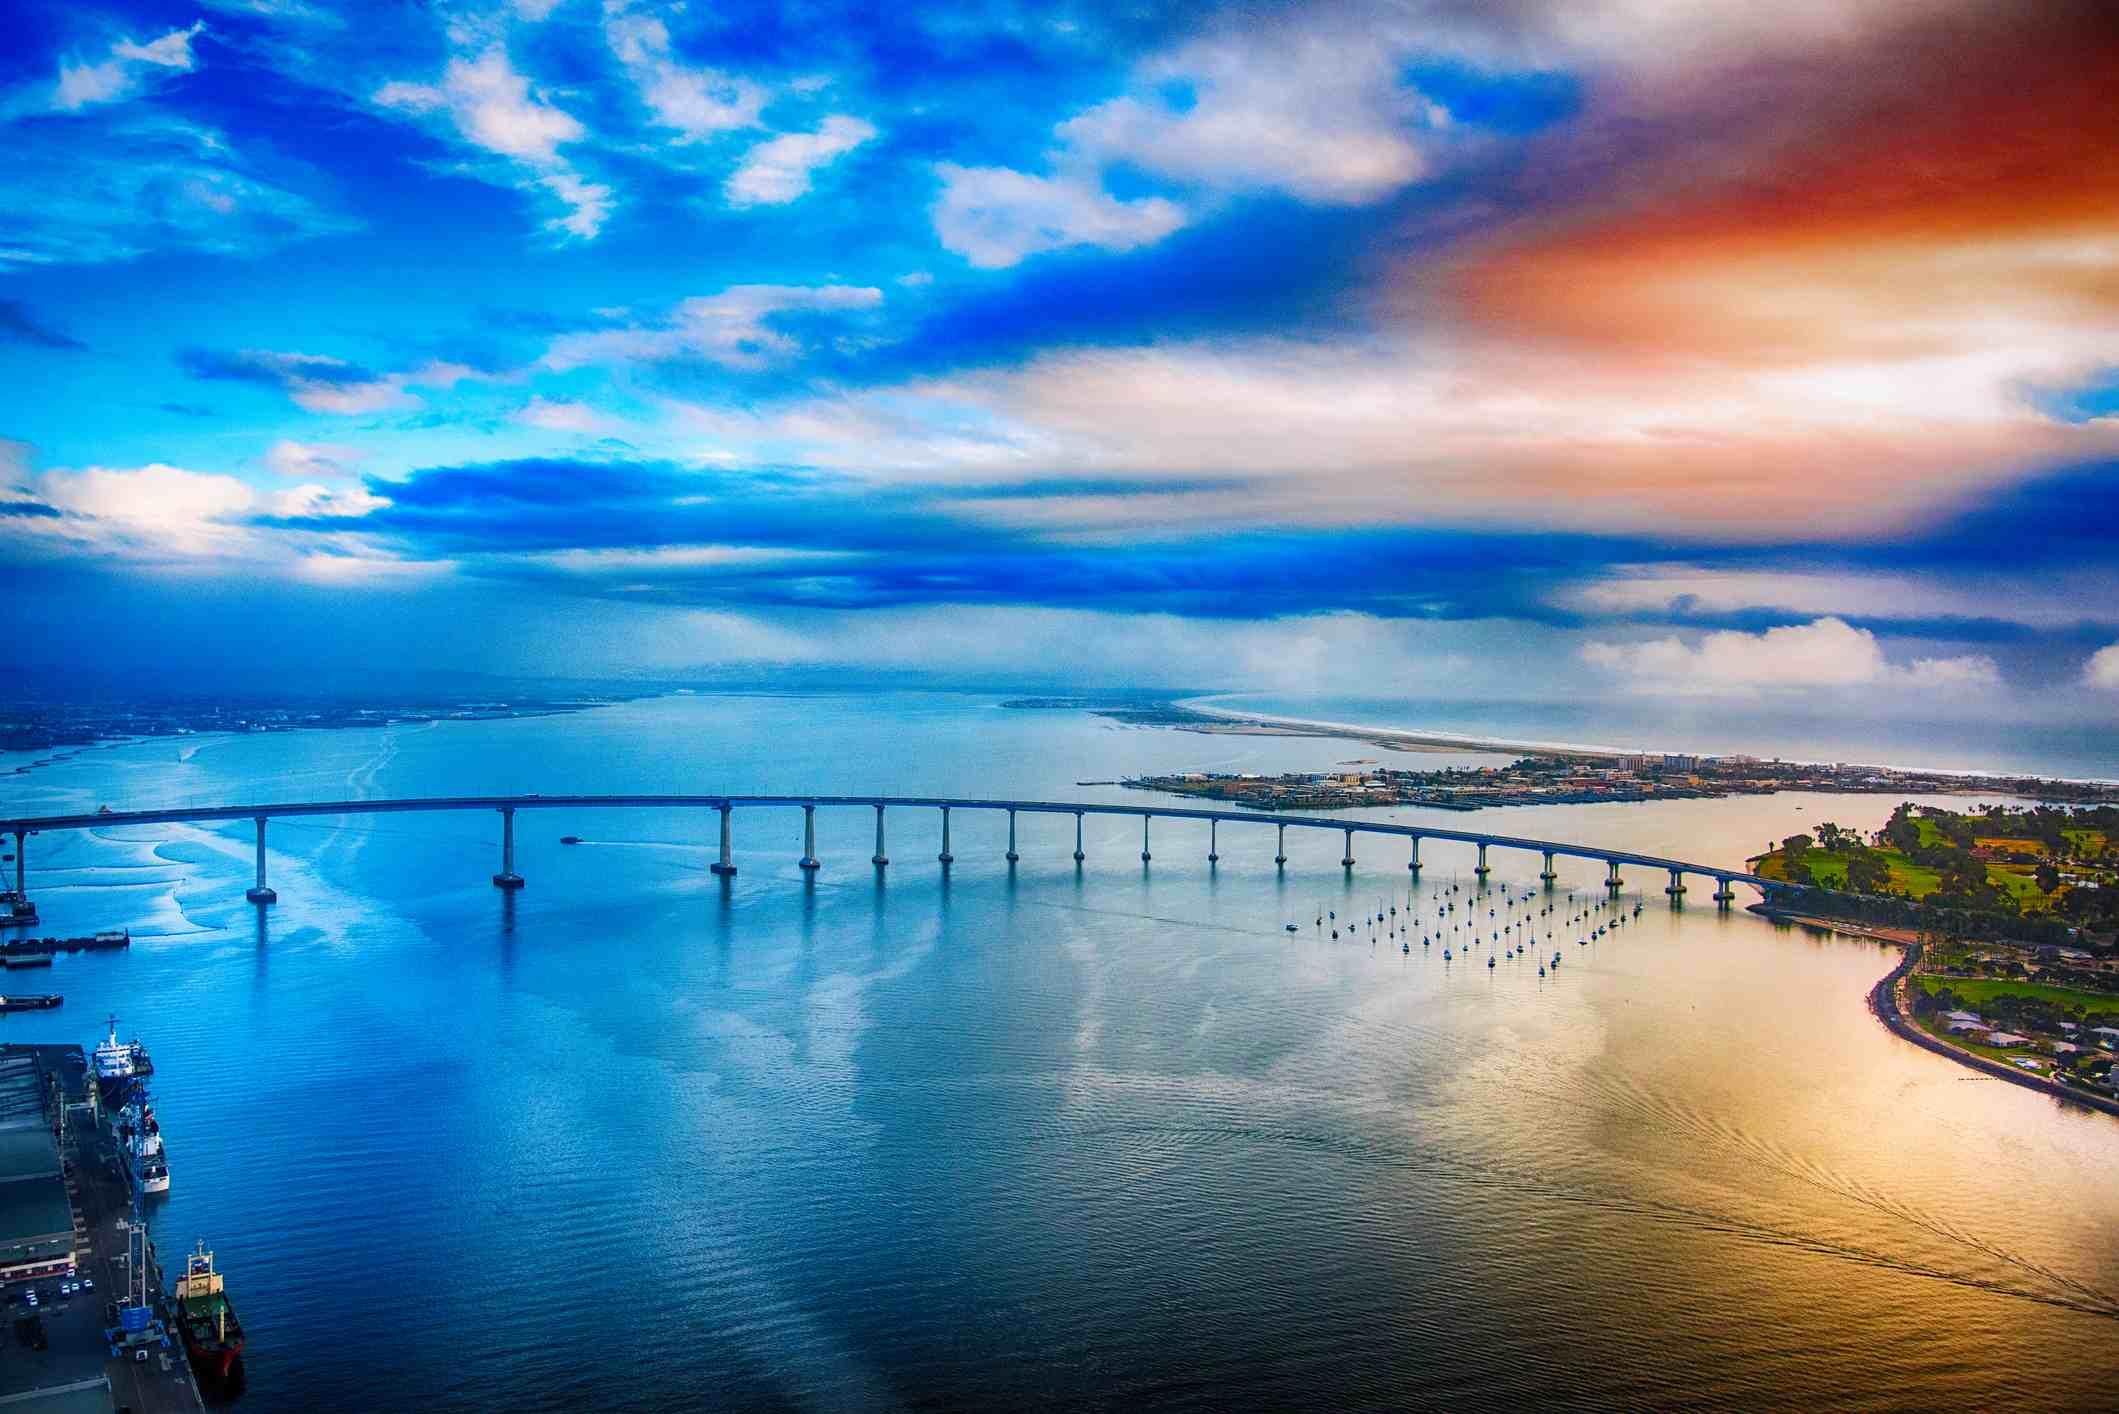 San Diego Coronado Bay Bridge at Dusk